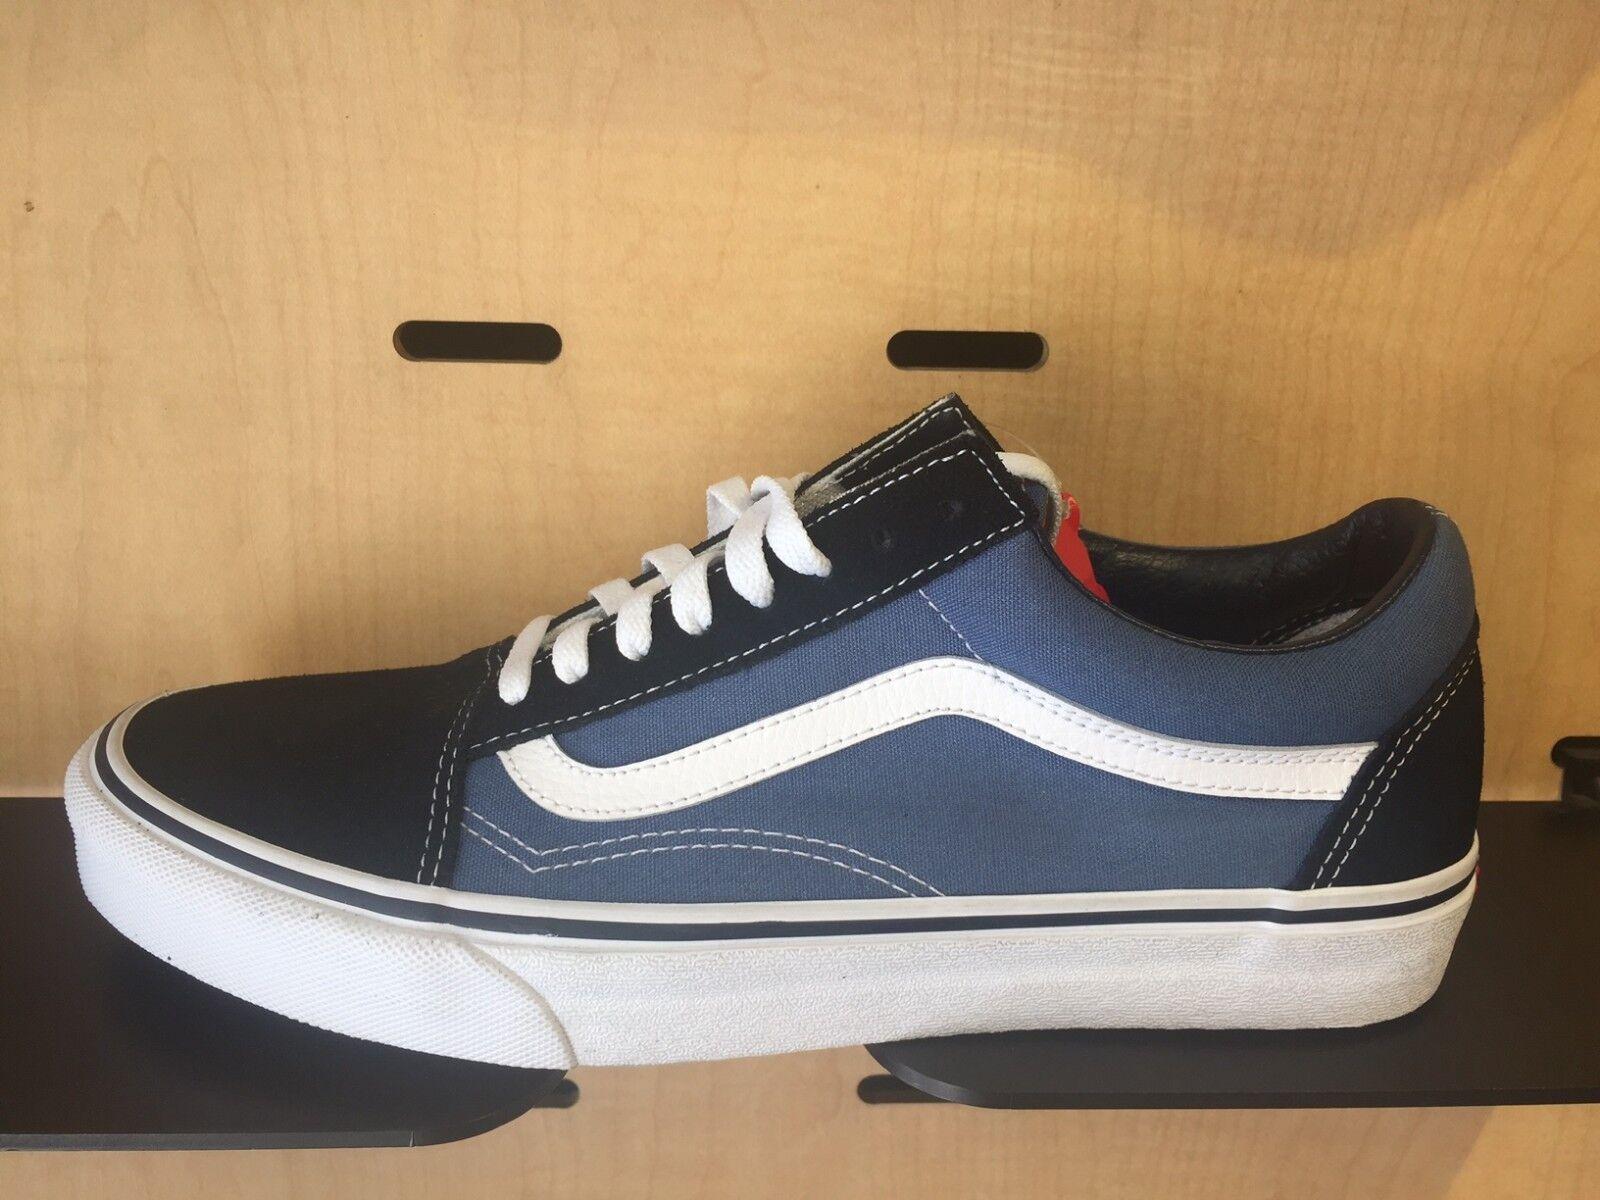 Vans Old Skool Black Navy White Size 8-13 New